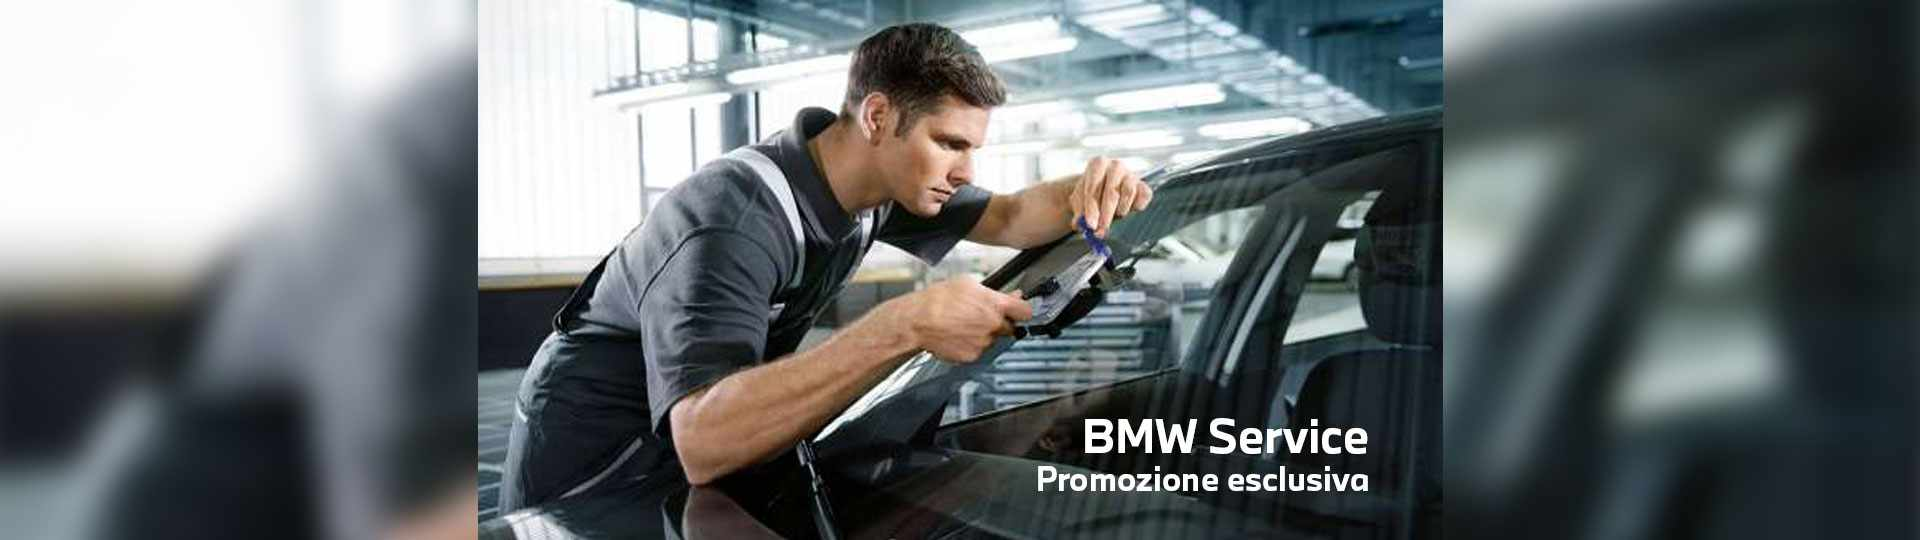 BMW_promo-manutenzione_ottobre-2020-min.jpg